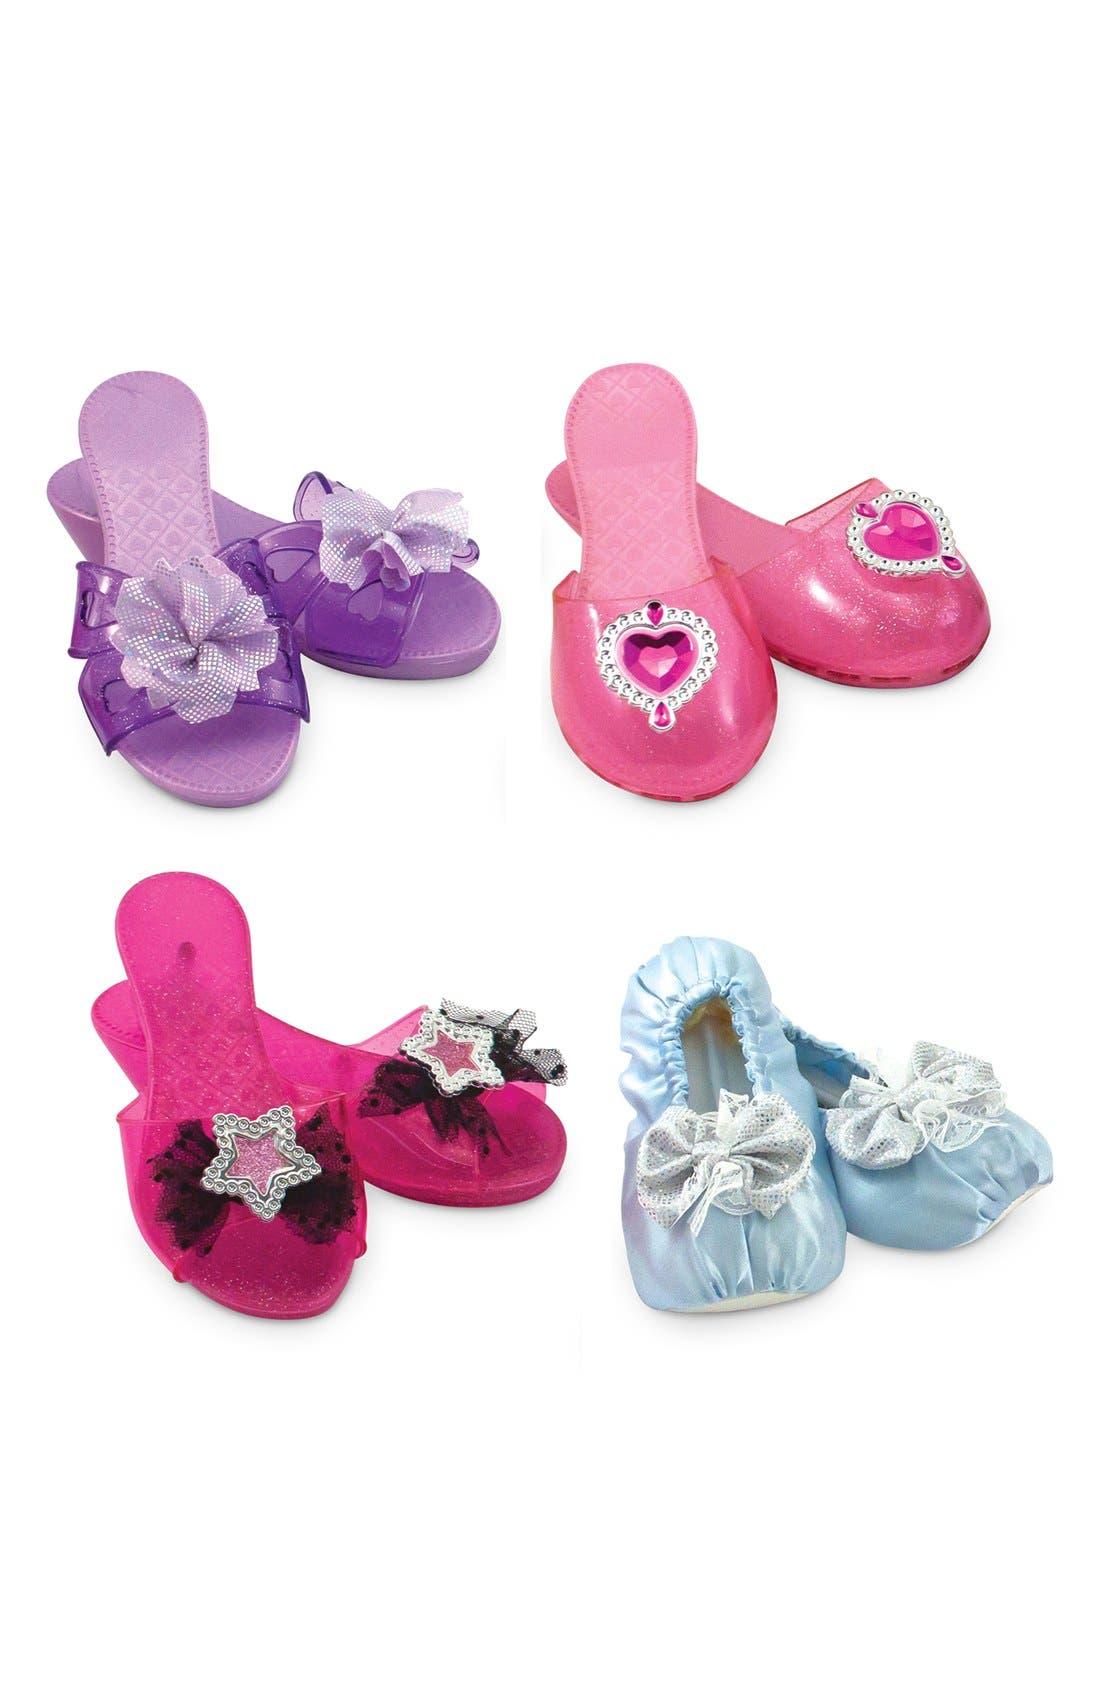 Dress-Up Shoe Set,                         Main,                         color, Pink